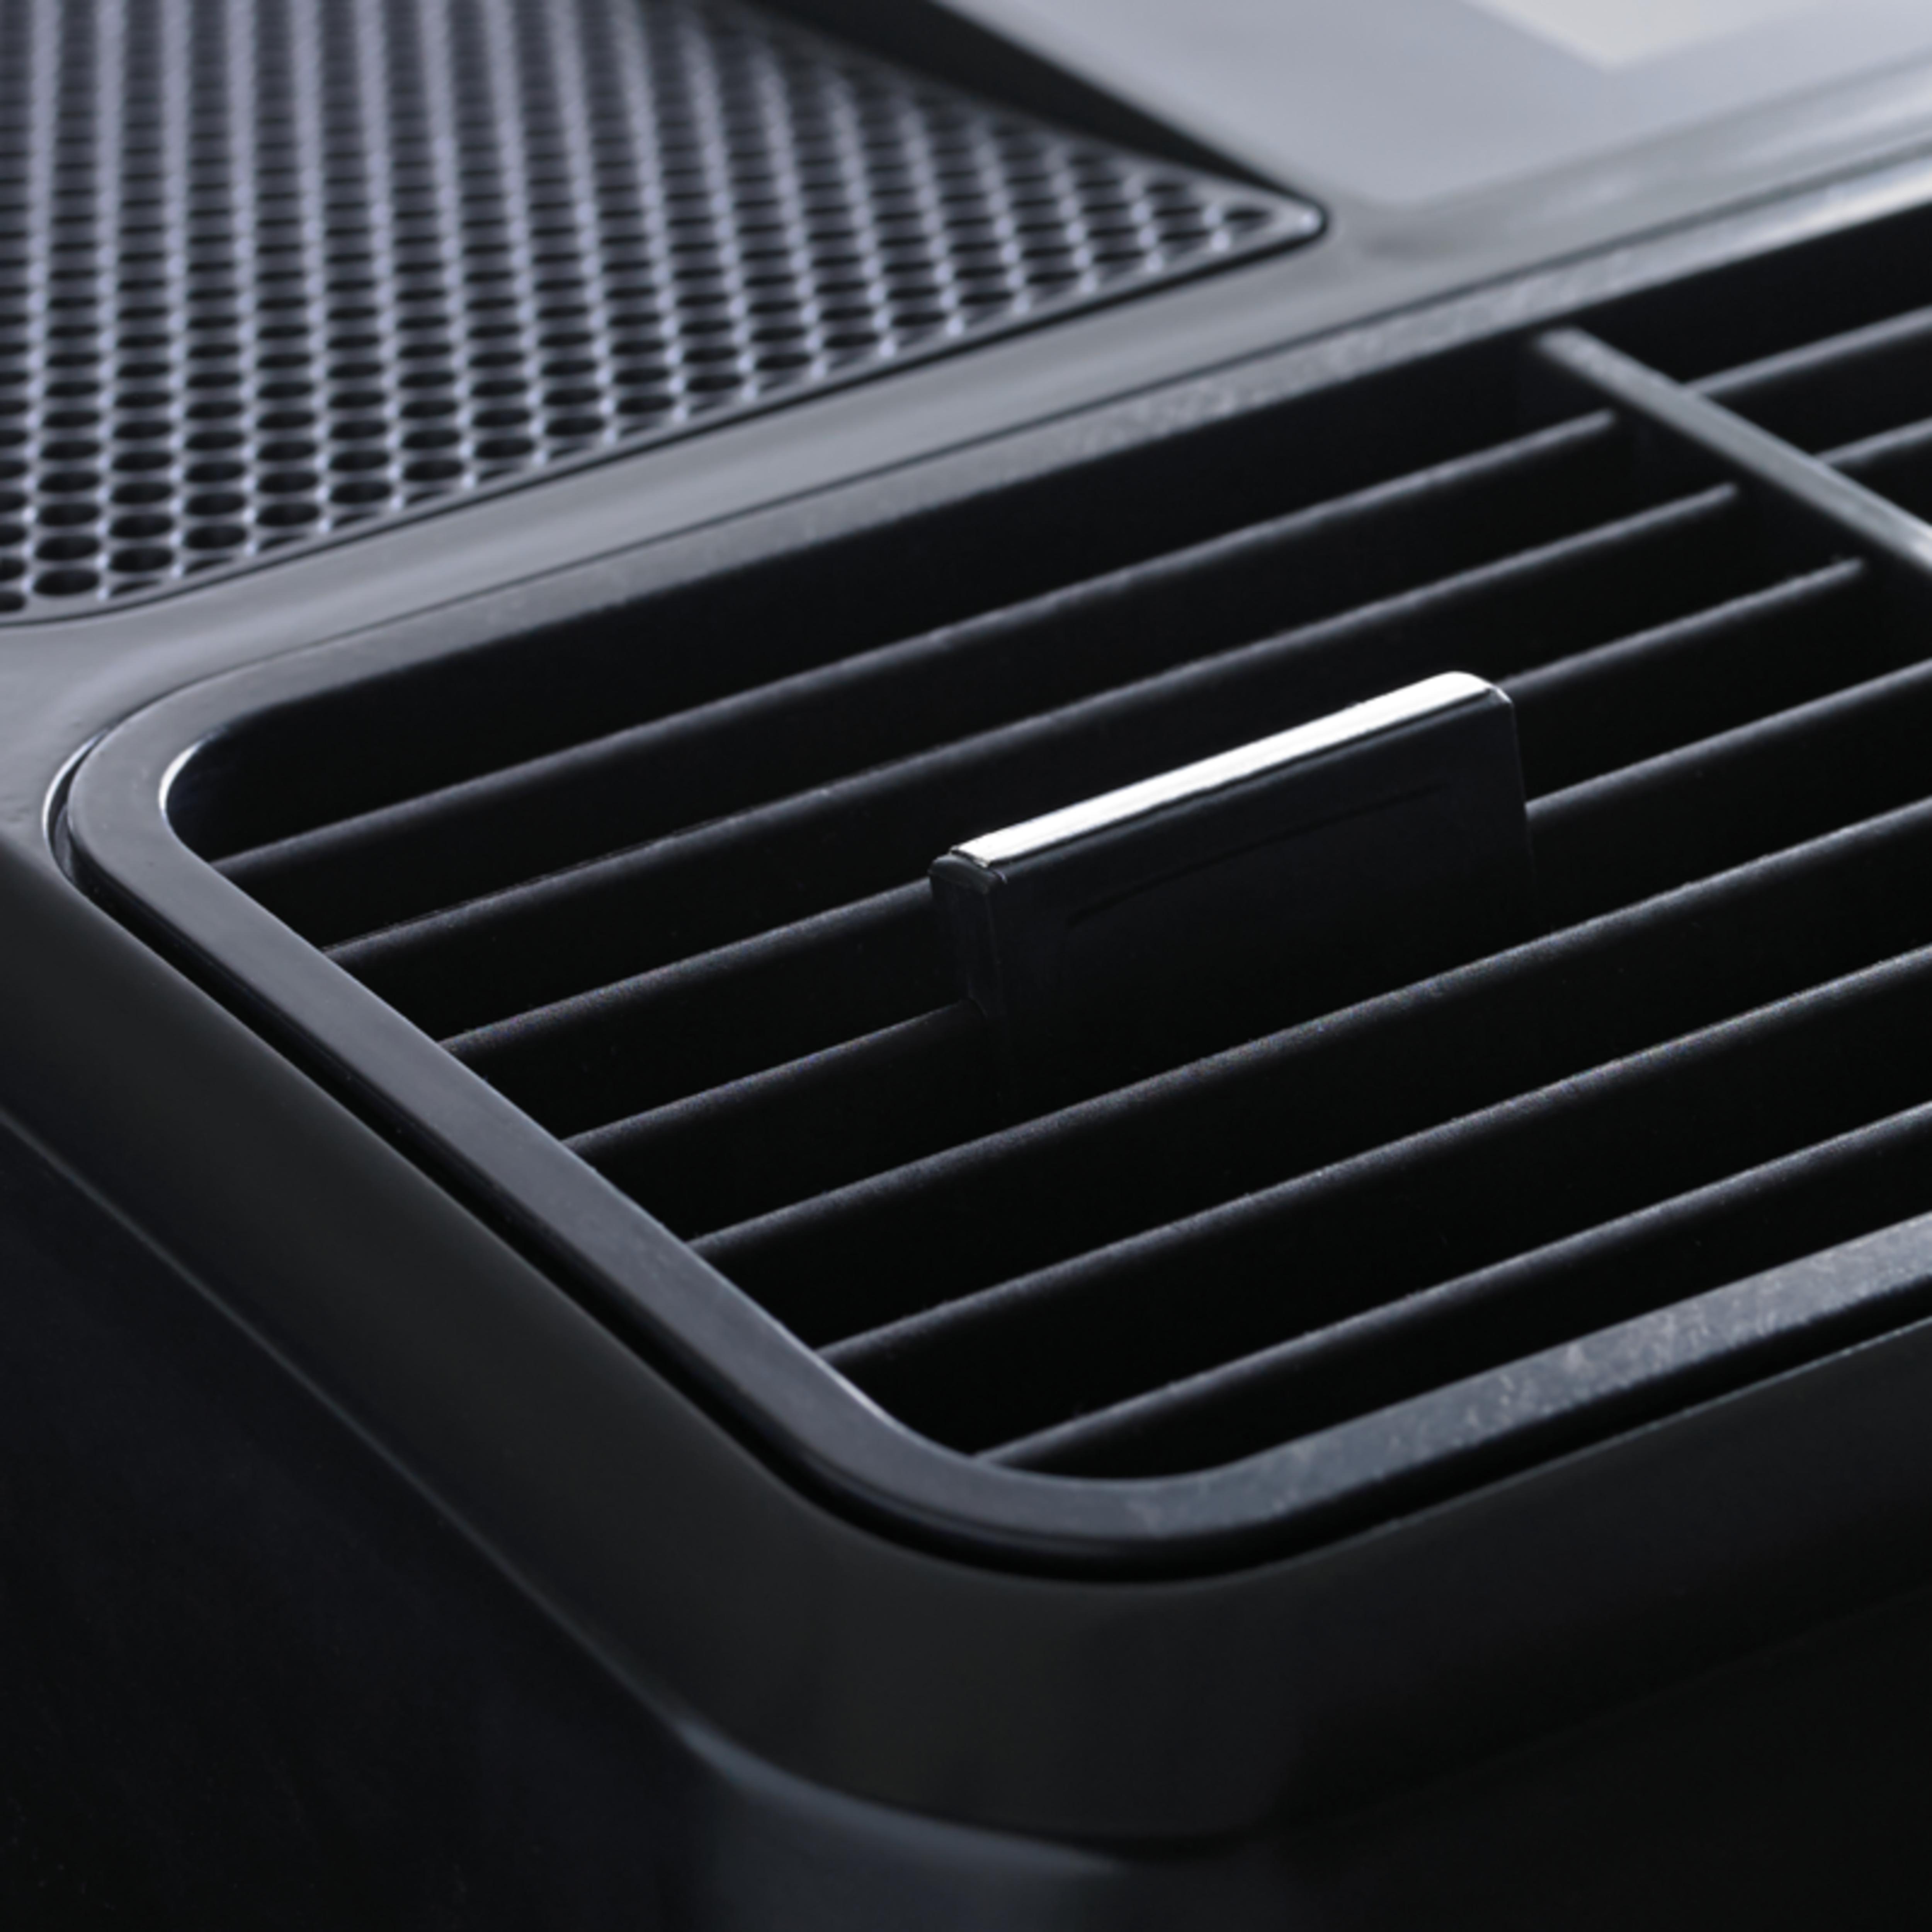 Maximale Kühlung, minimaler Energieverbrauch